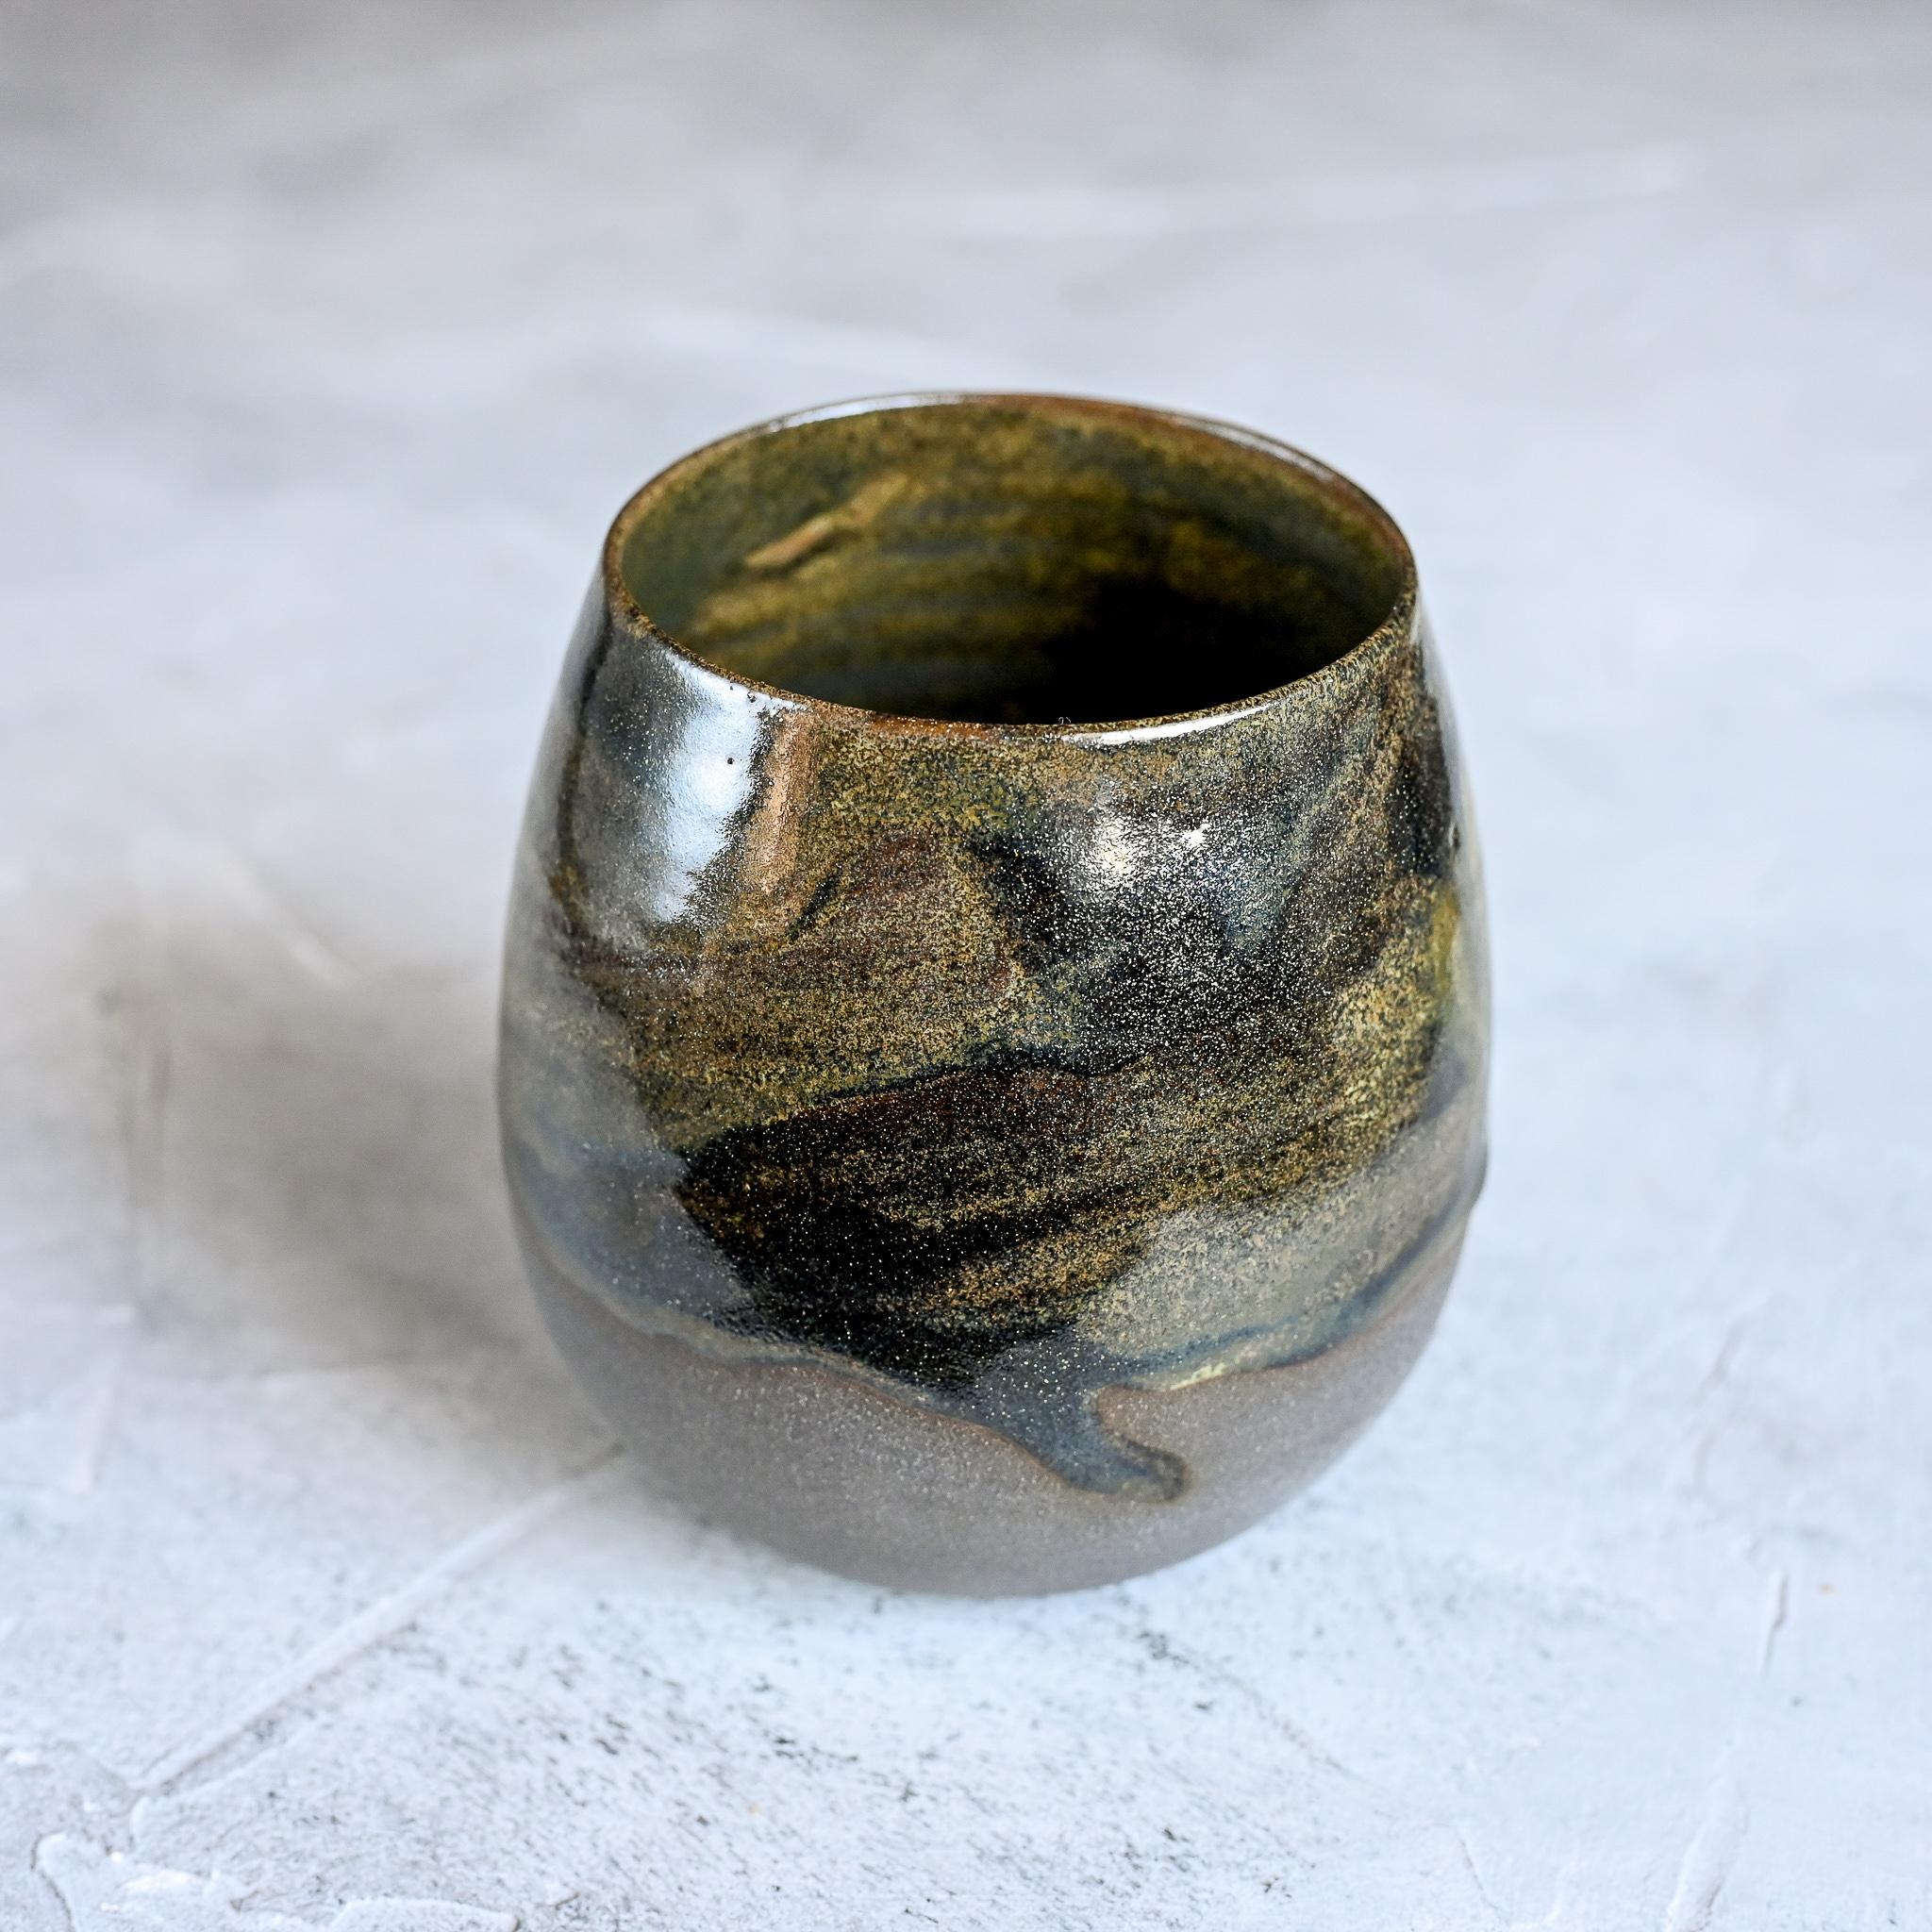 картинка Керамический стакан Марии Левиной 8 - DishWishes.Ru